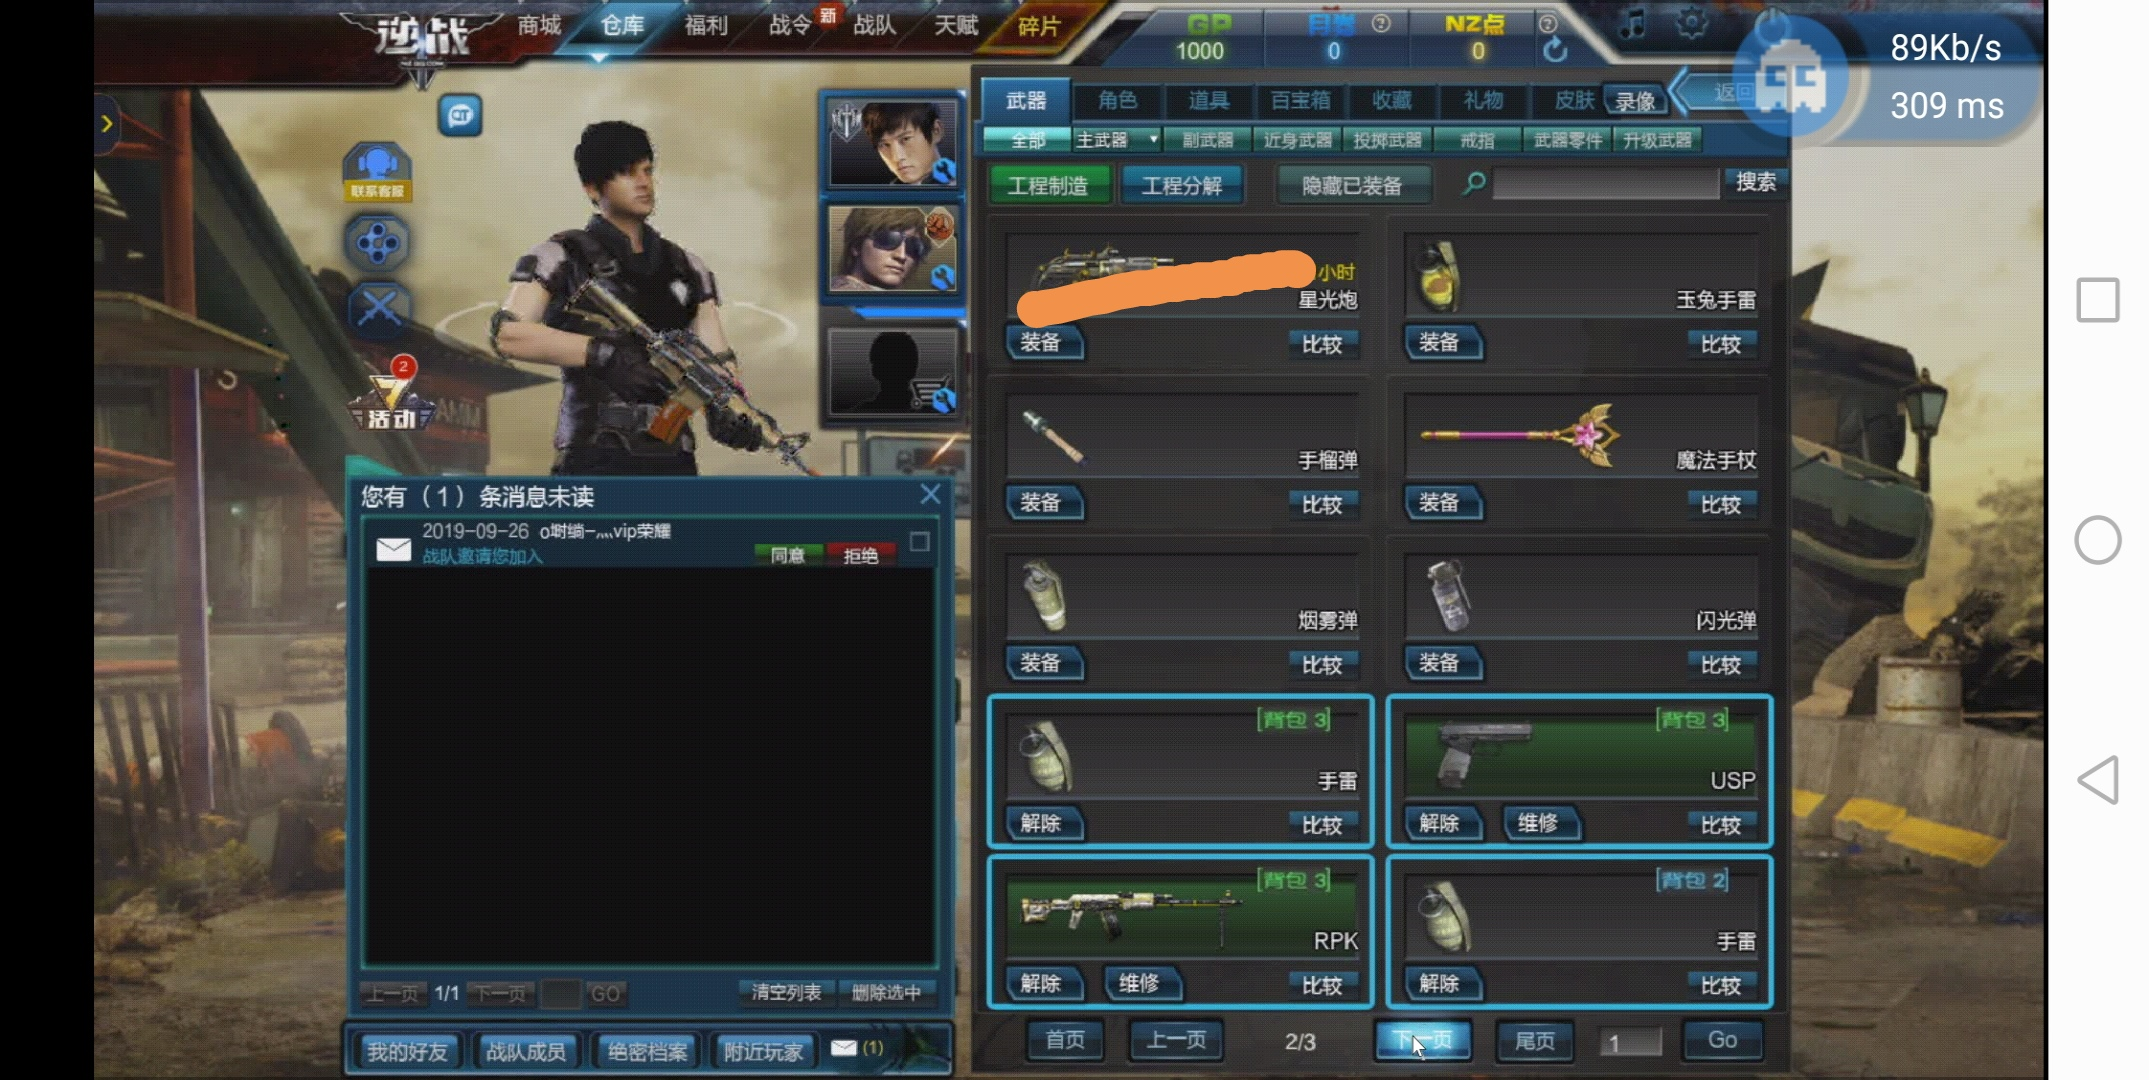 fcd15武器人物6n个东西无顶号第3方软件的的不要来|逆战租号|逆战借号-猎号网